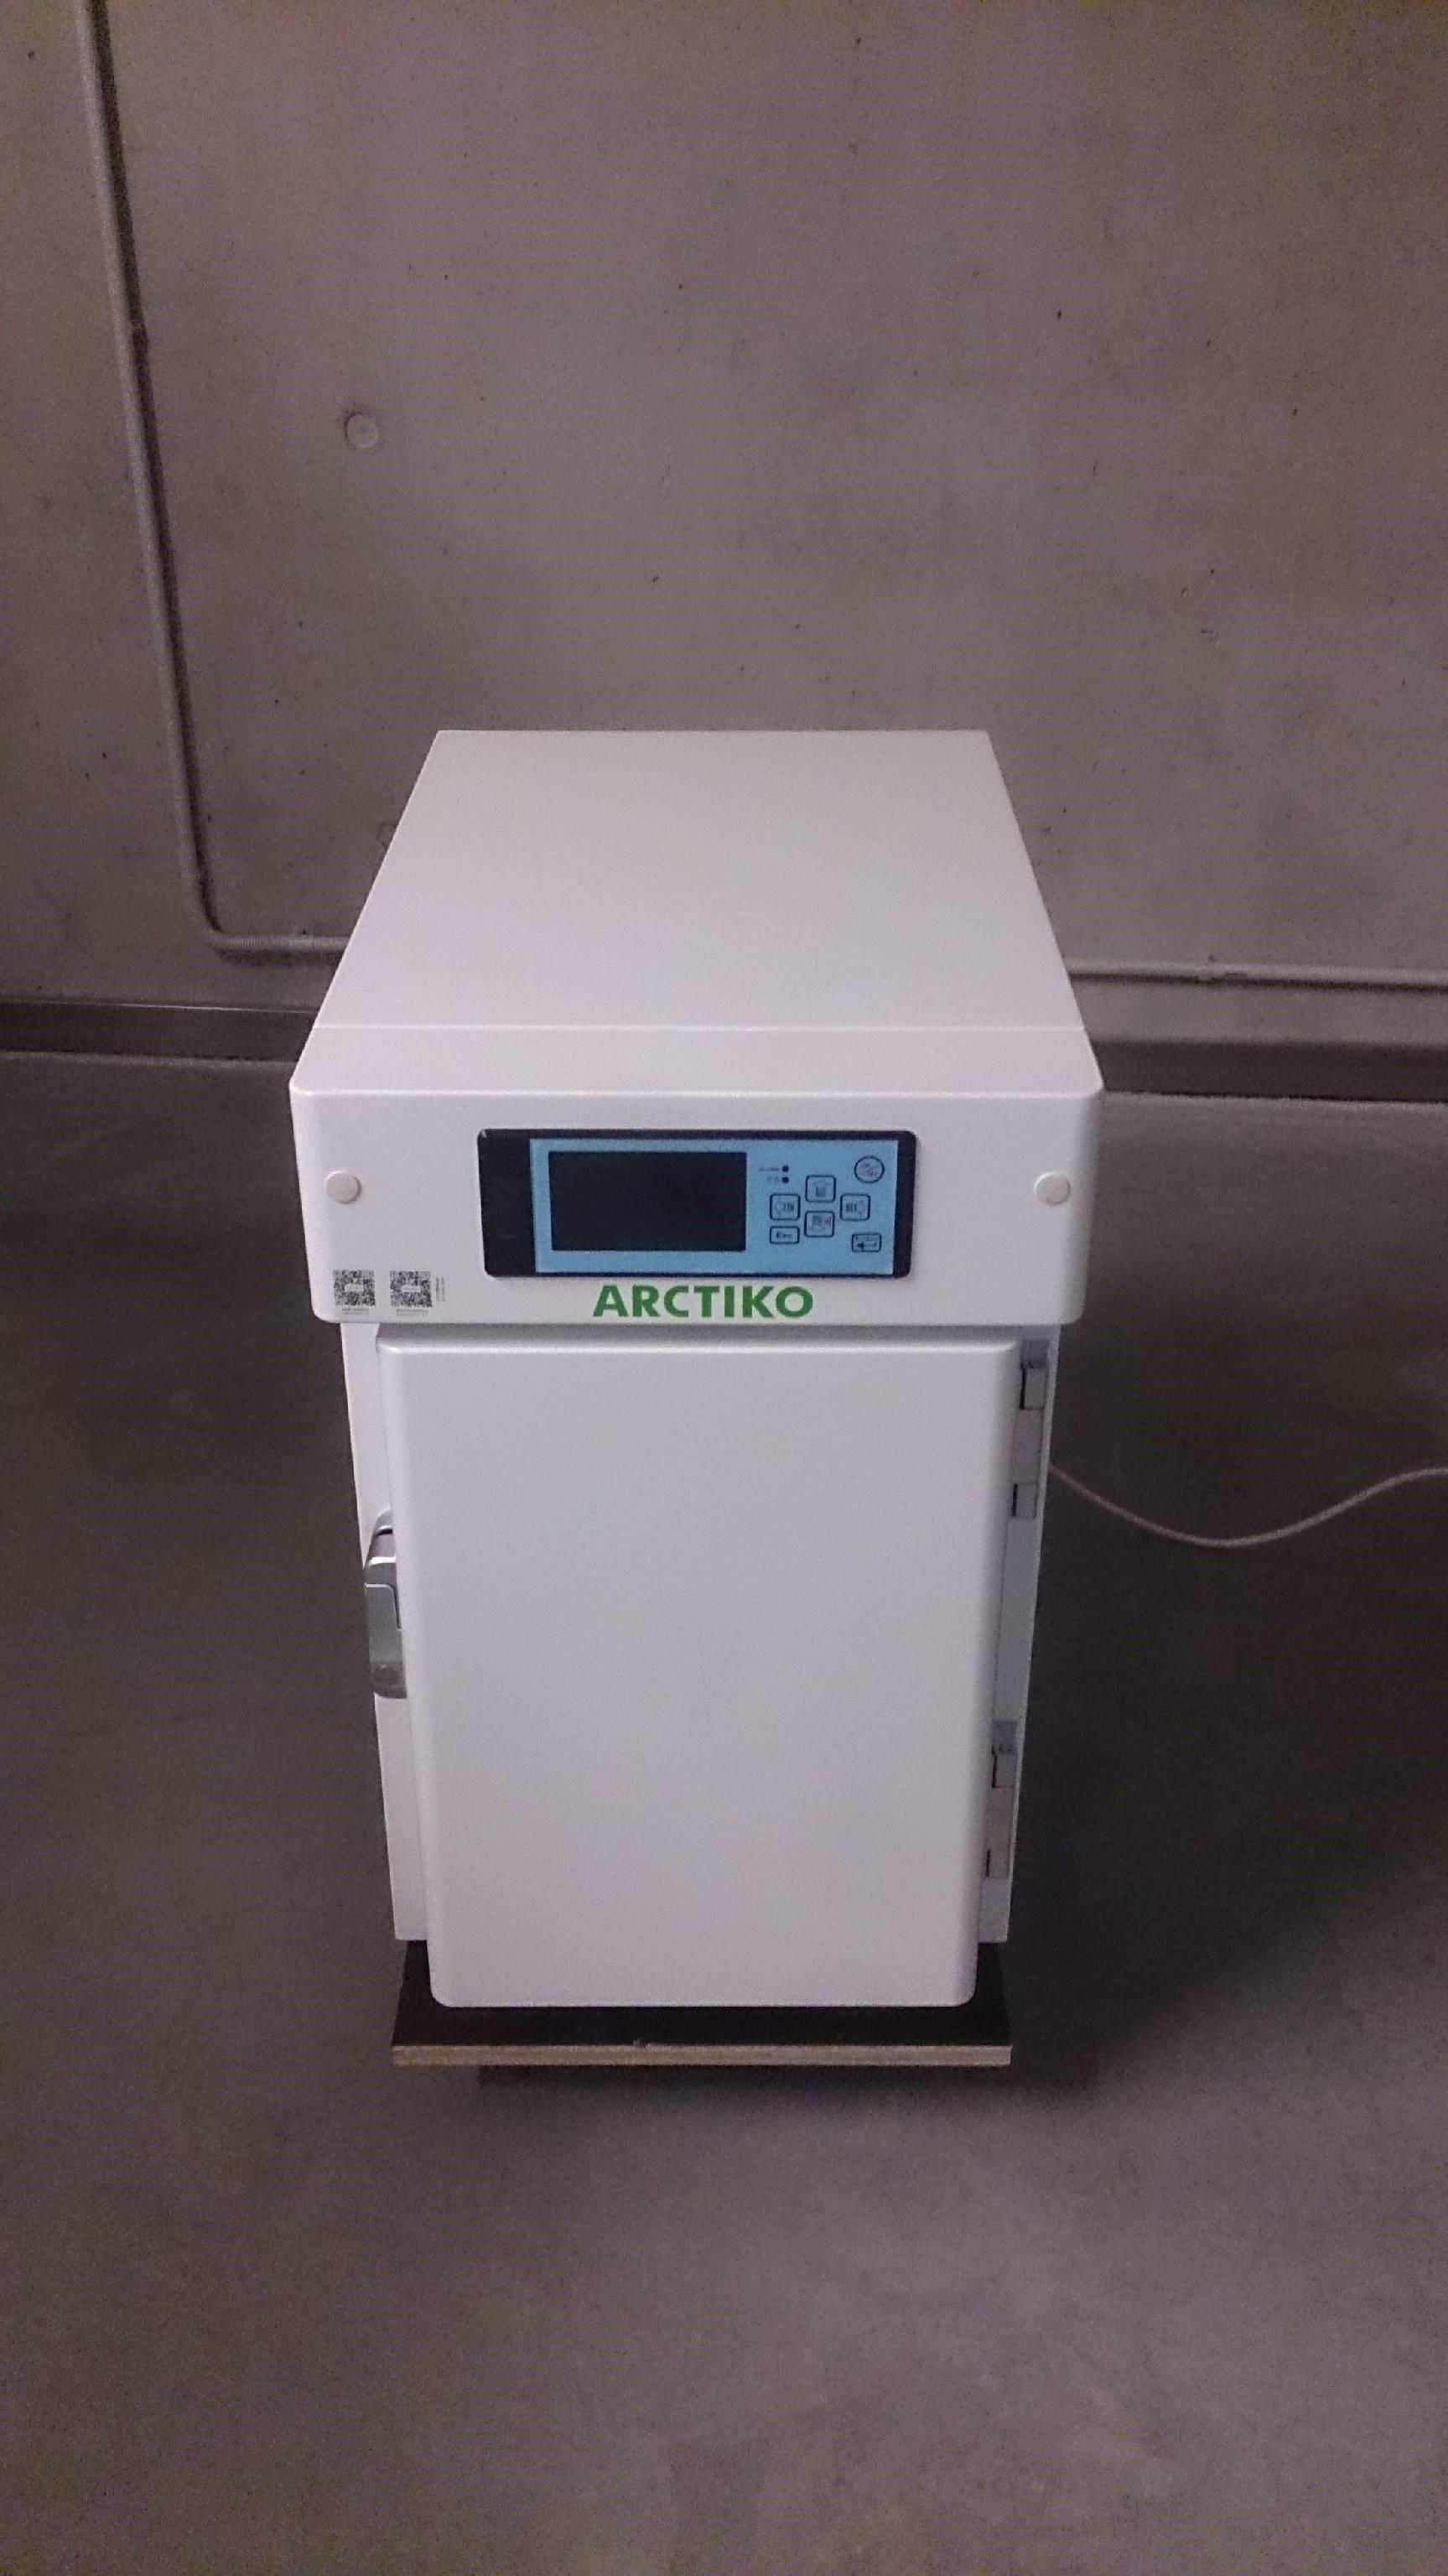 Ultra Low Temperature Freezer Uluf 15 Arctiko Usescience